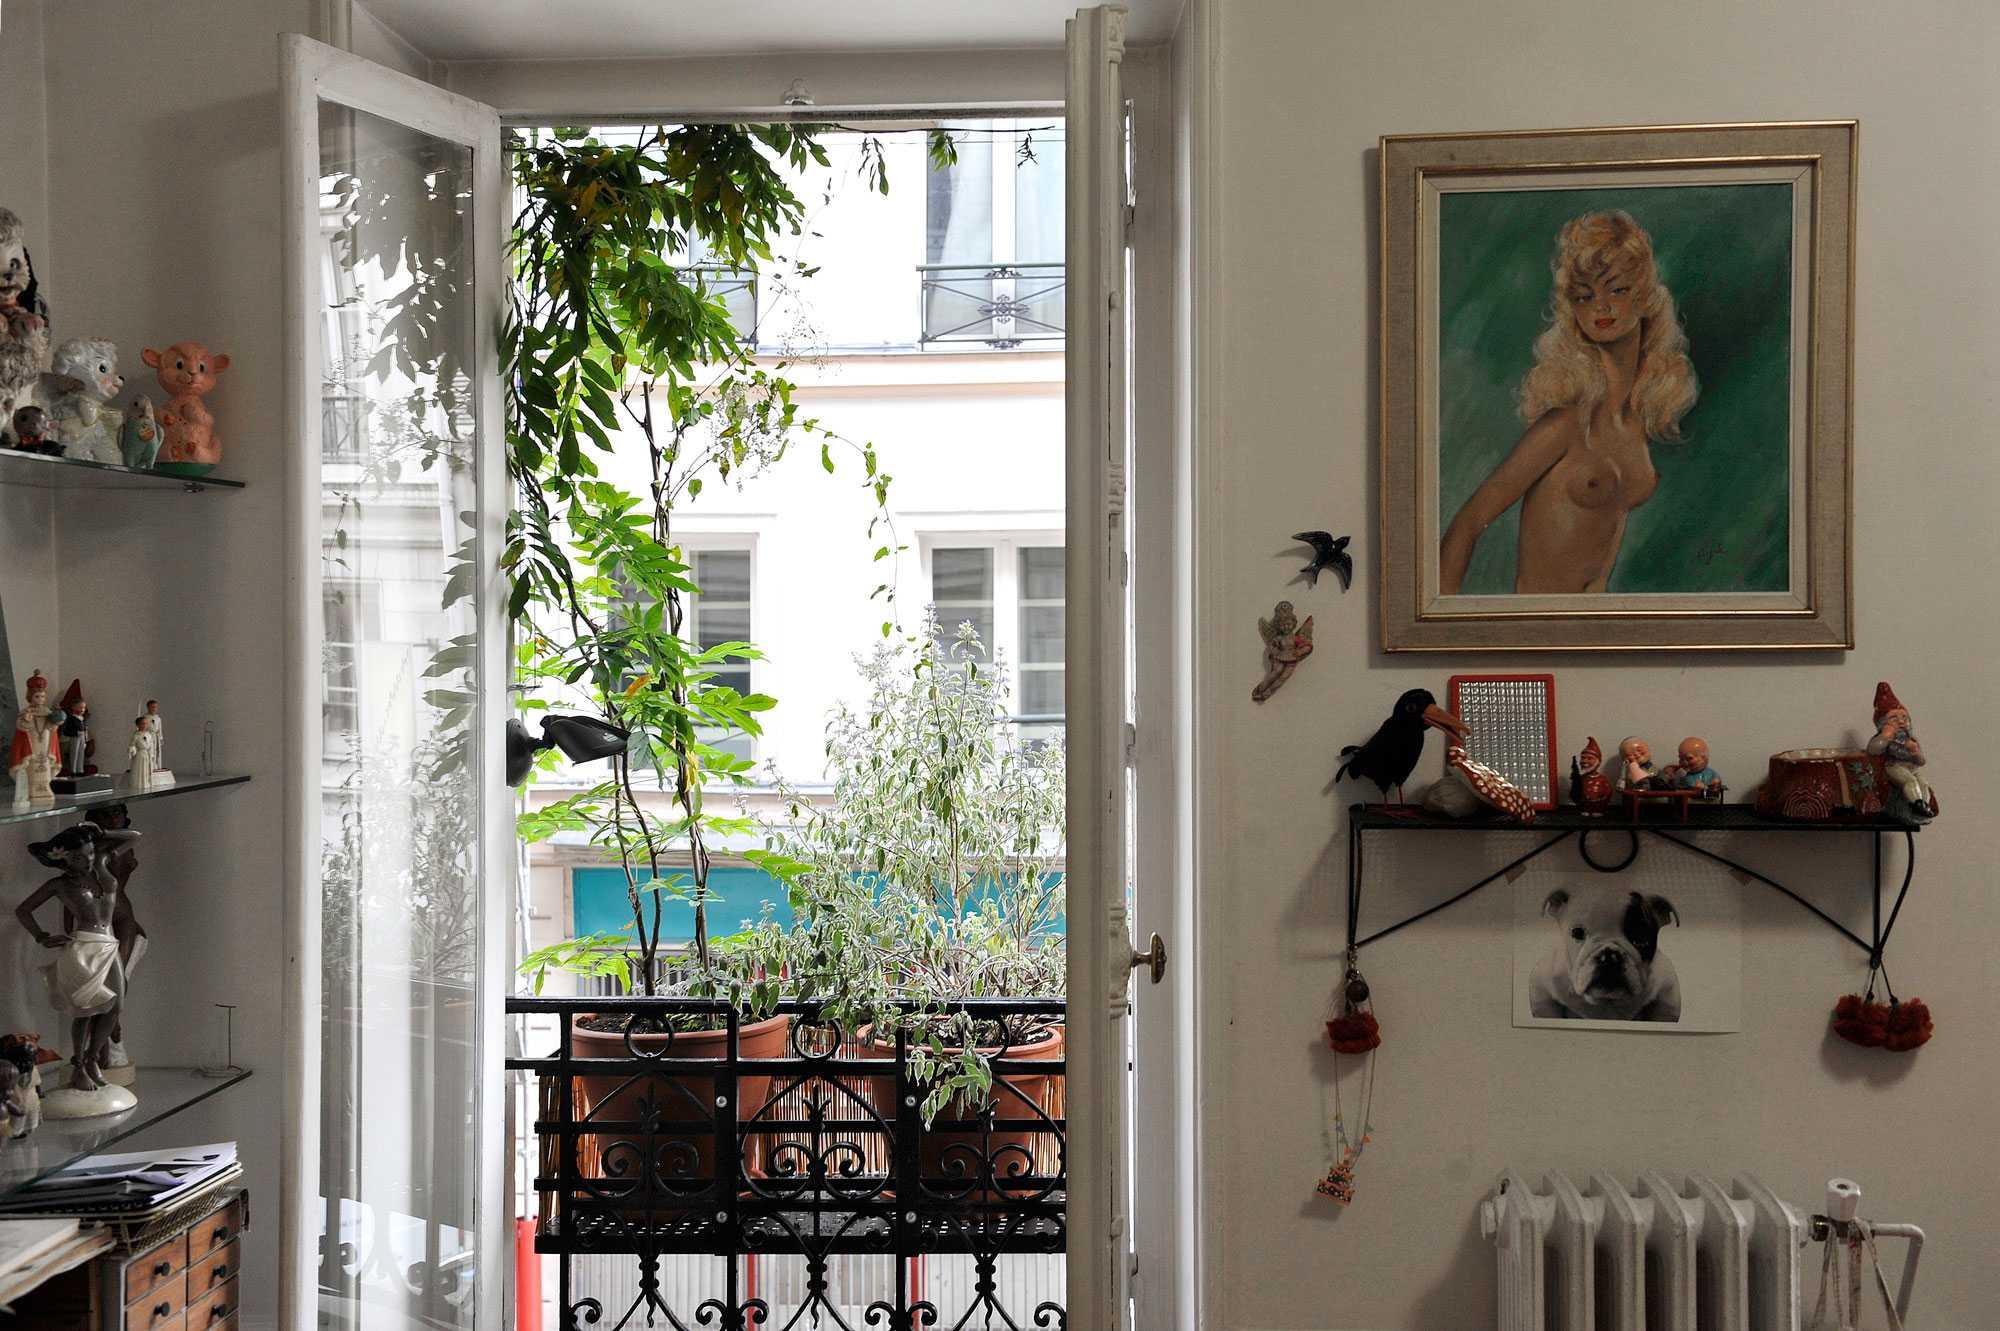 bourg 02 le vert soi. Black Bedroom Furniture Sets. Home Design Ideas